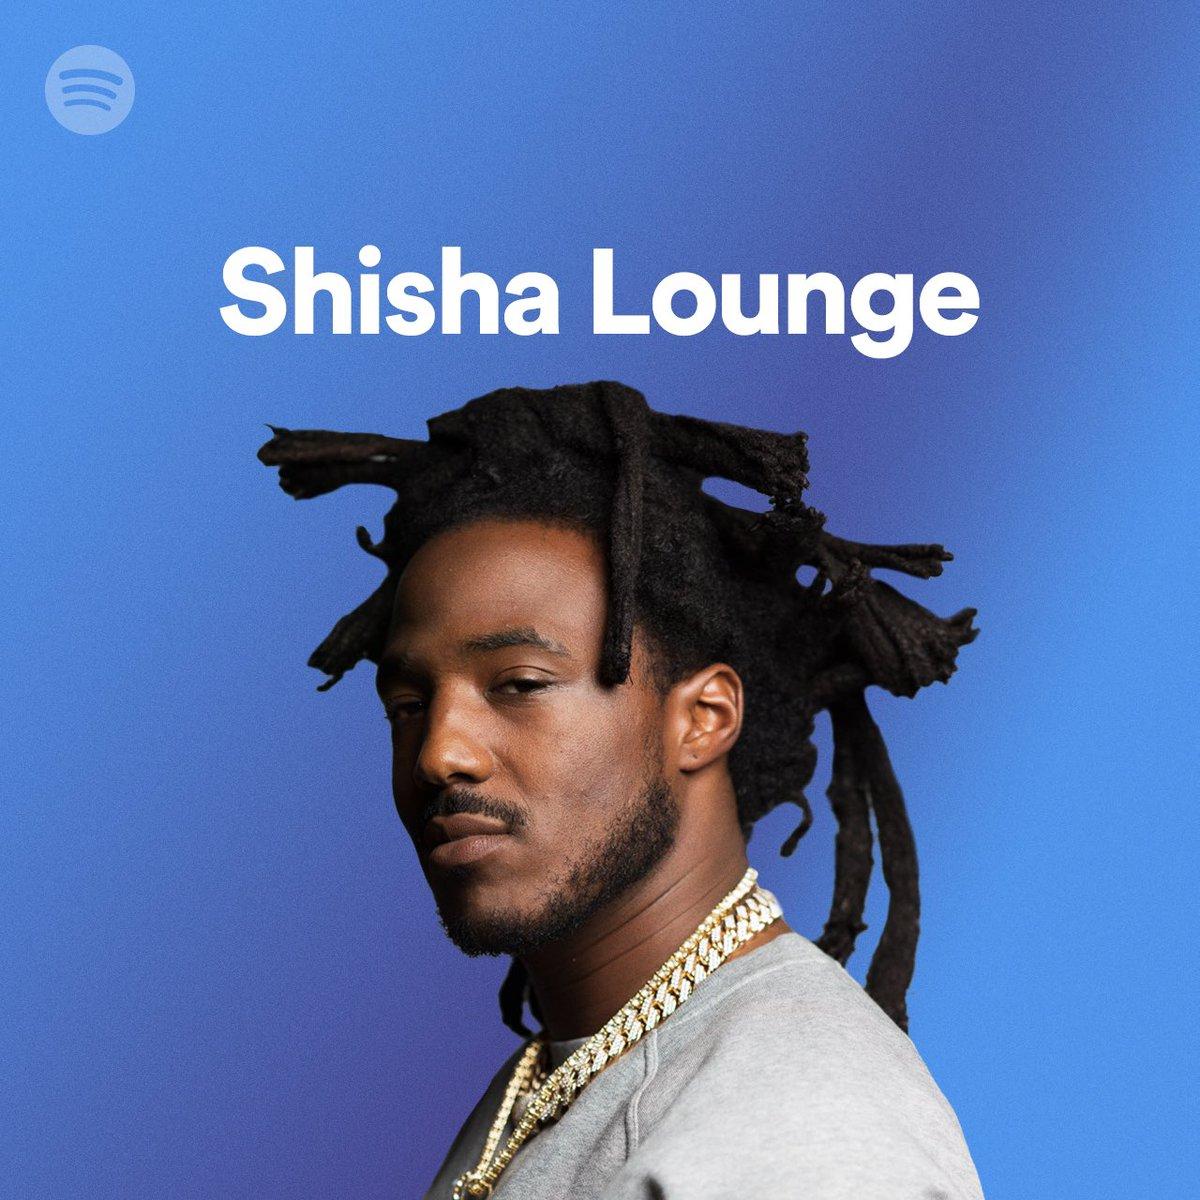 Cover of #ShishaLounge!!!! 🔥🔥🔥🔥🔥 S/O @spotify 🖤 spoti.fi/35yWMuN